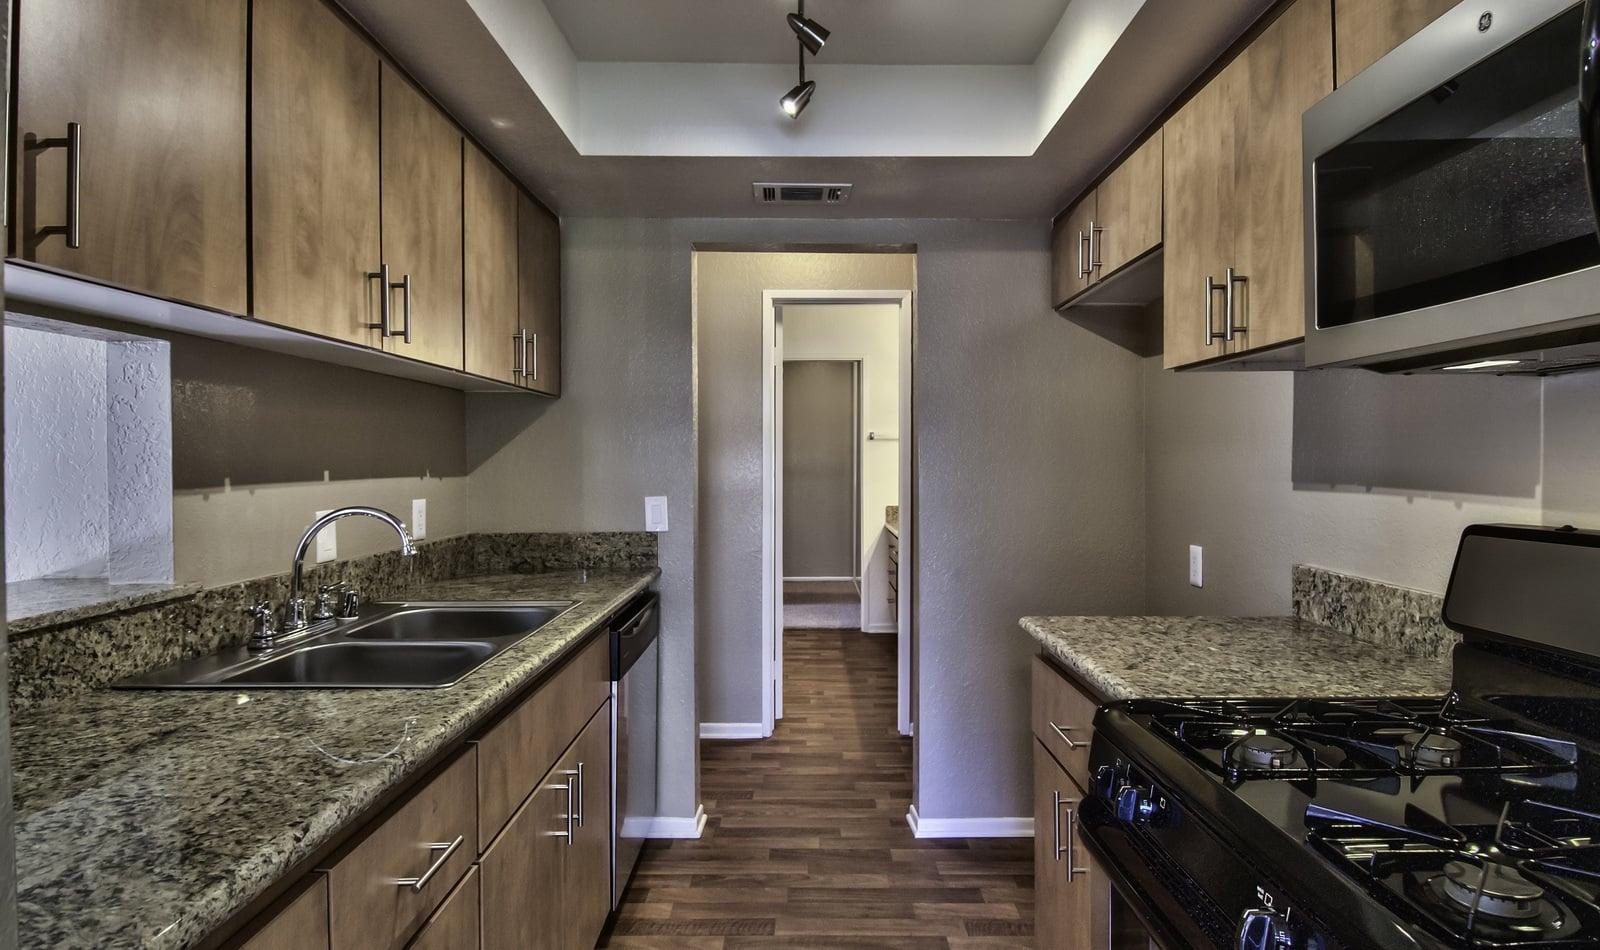 Kitchen at Alvista Canyons